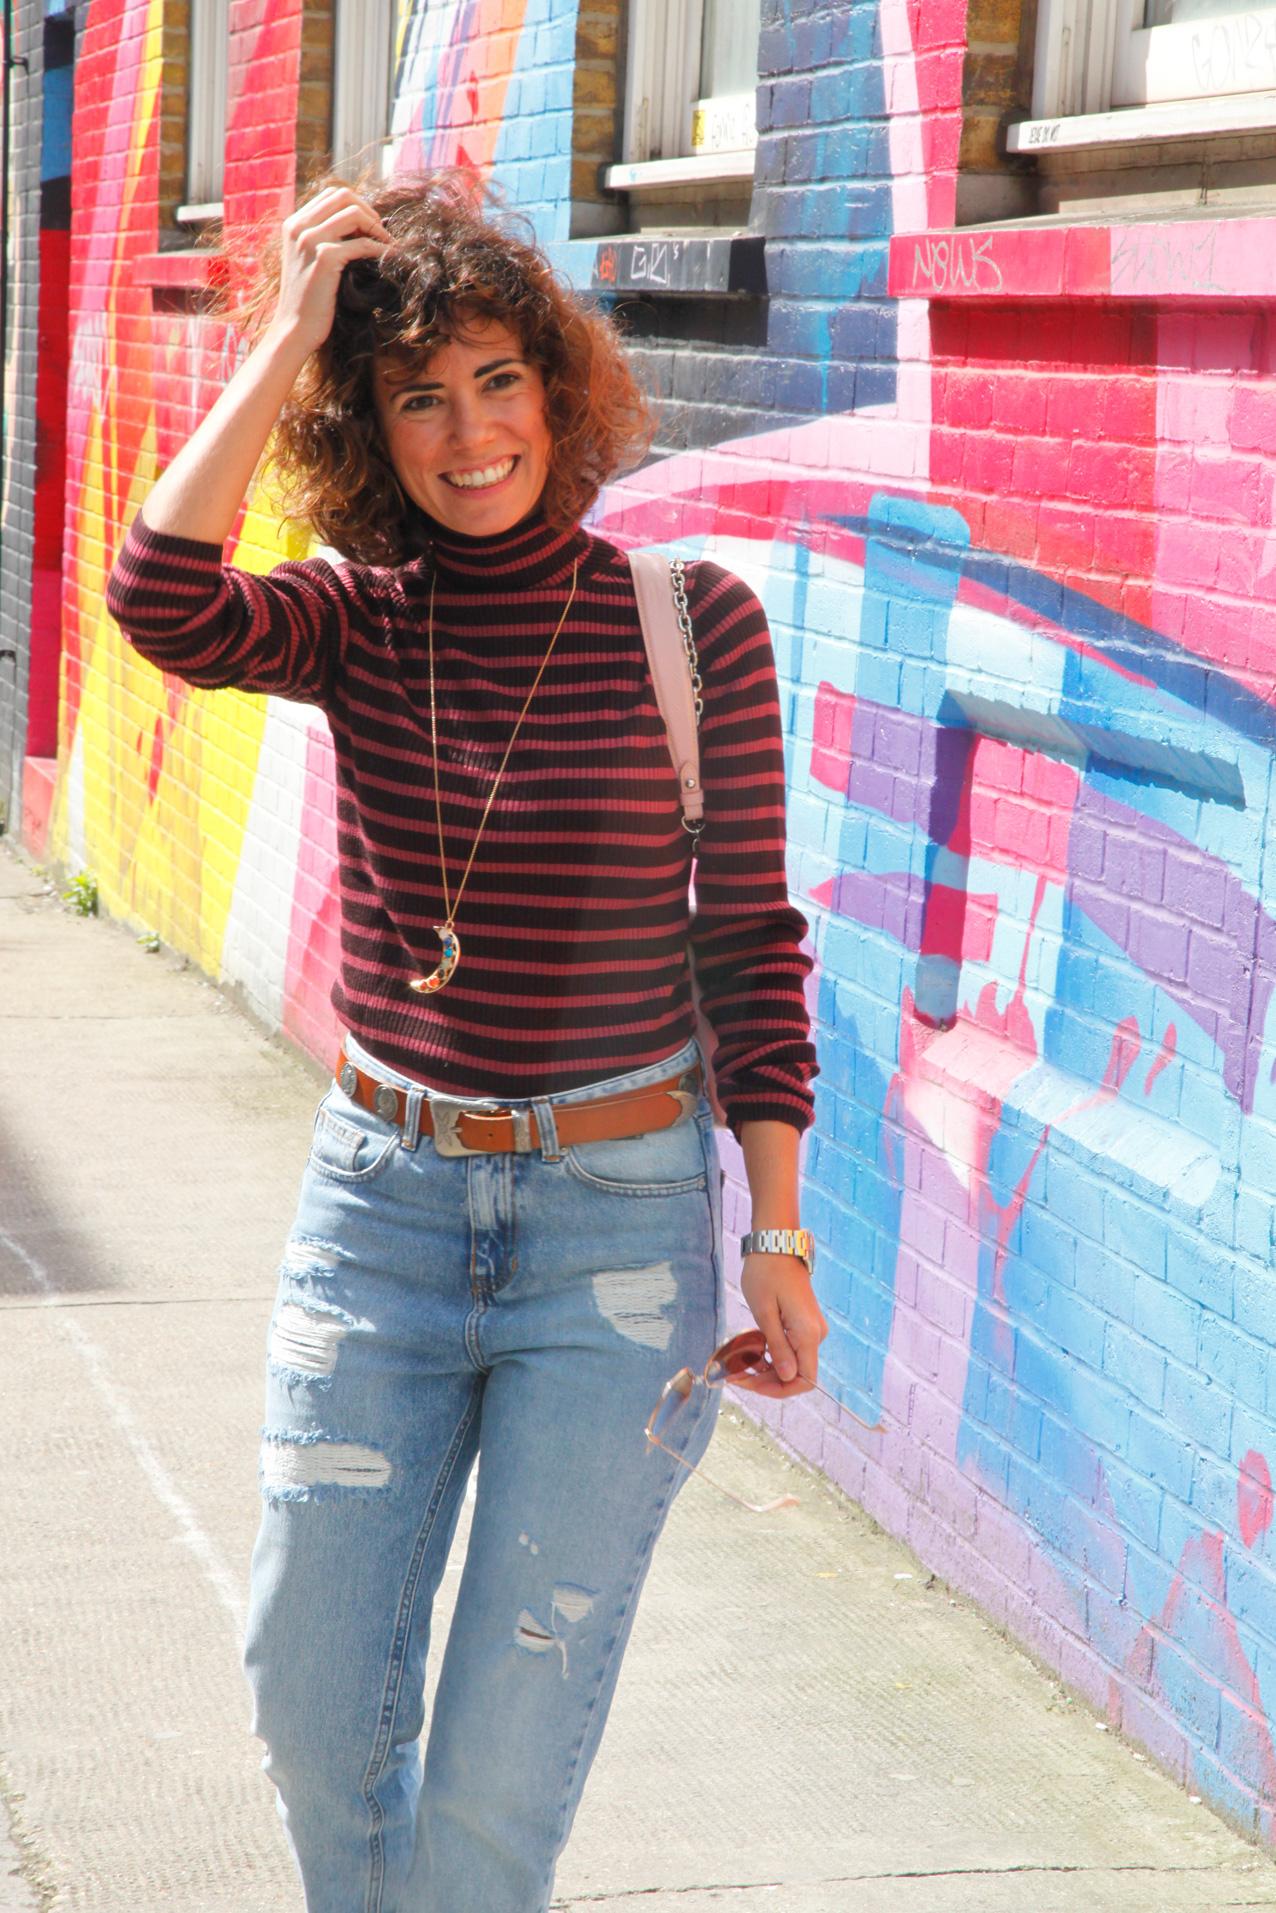 brick_lane-stripped-roll-up-sweater-boy_jeans_streetstyle-cool_lemonade